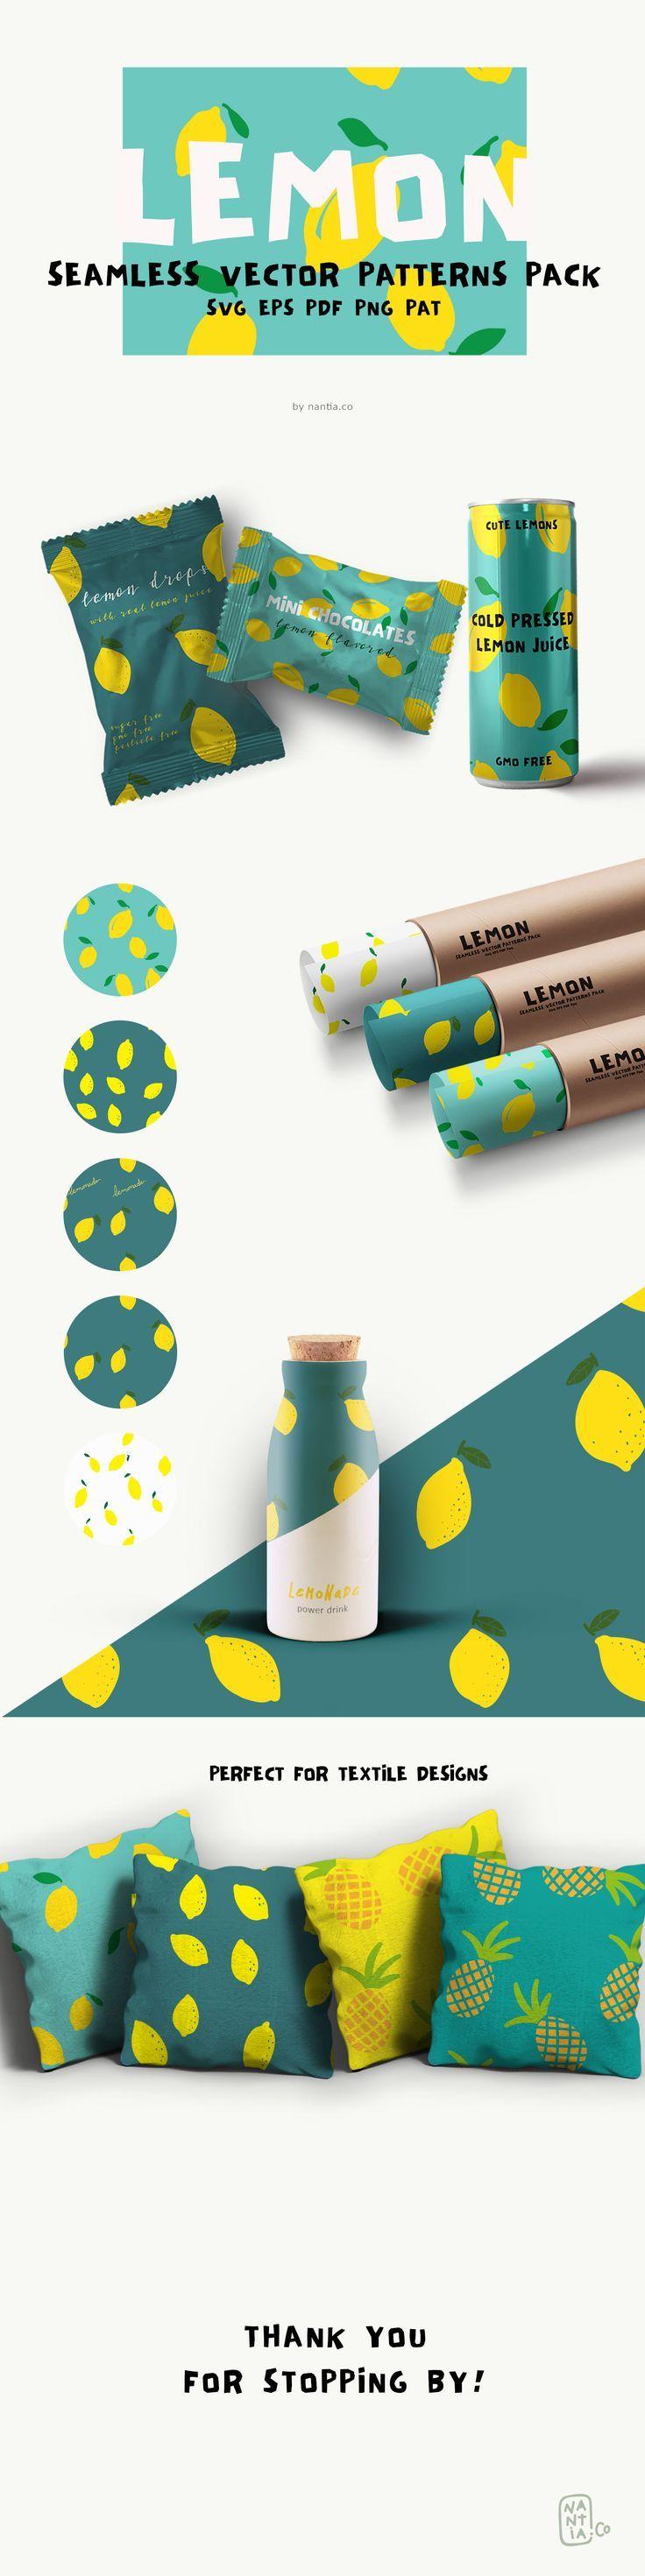 Lemon Seamless Vector Patterns Pack. Buy patterns by Nantia.co